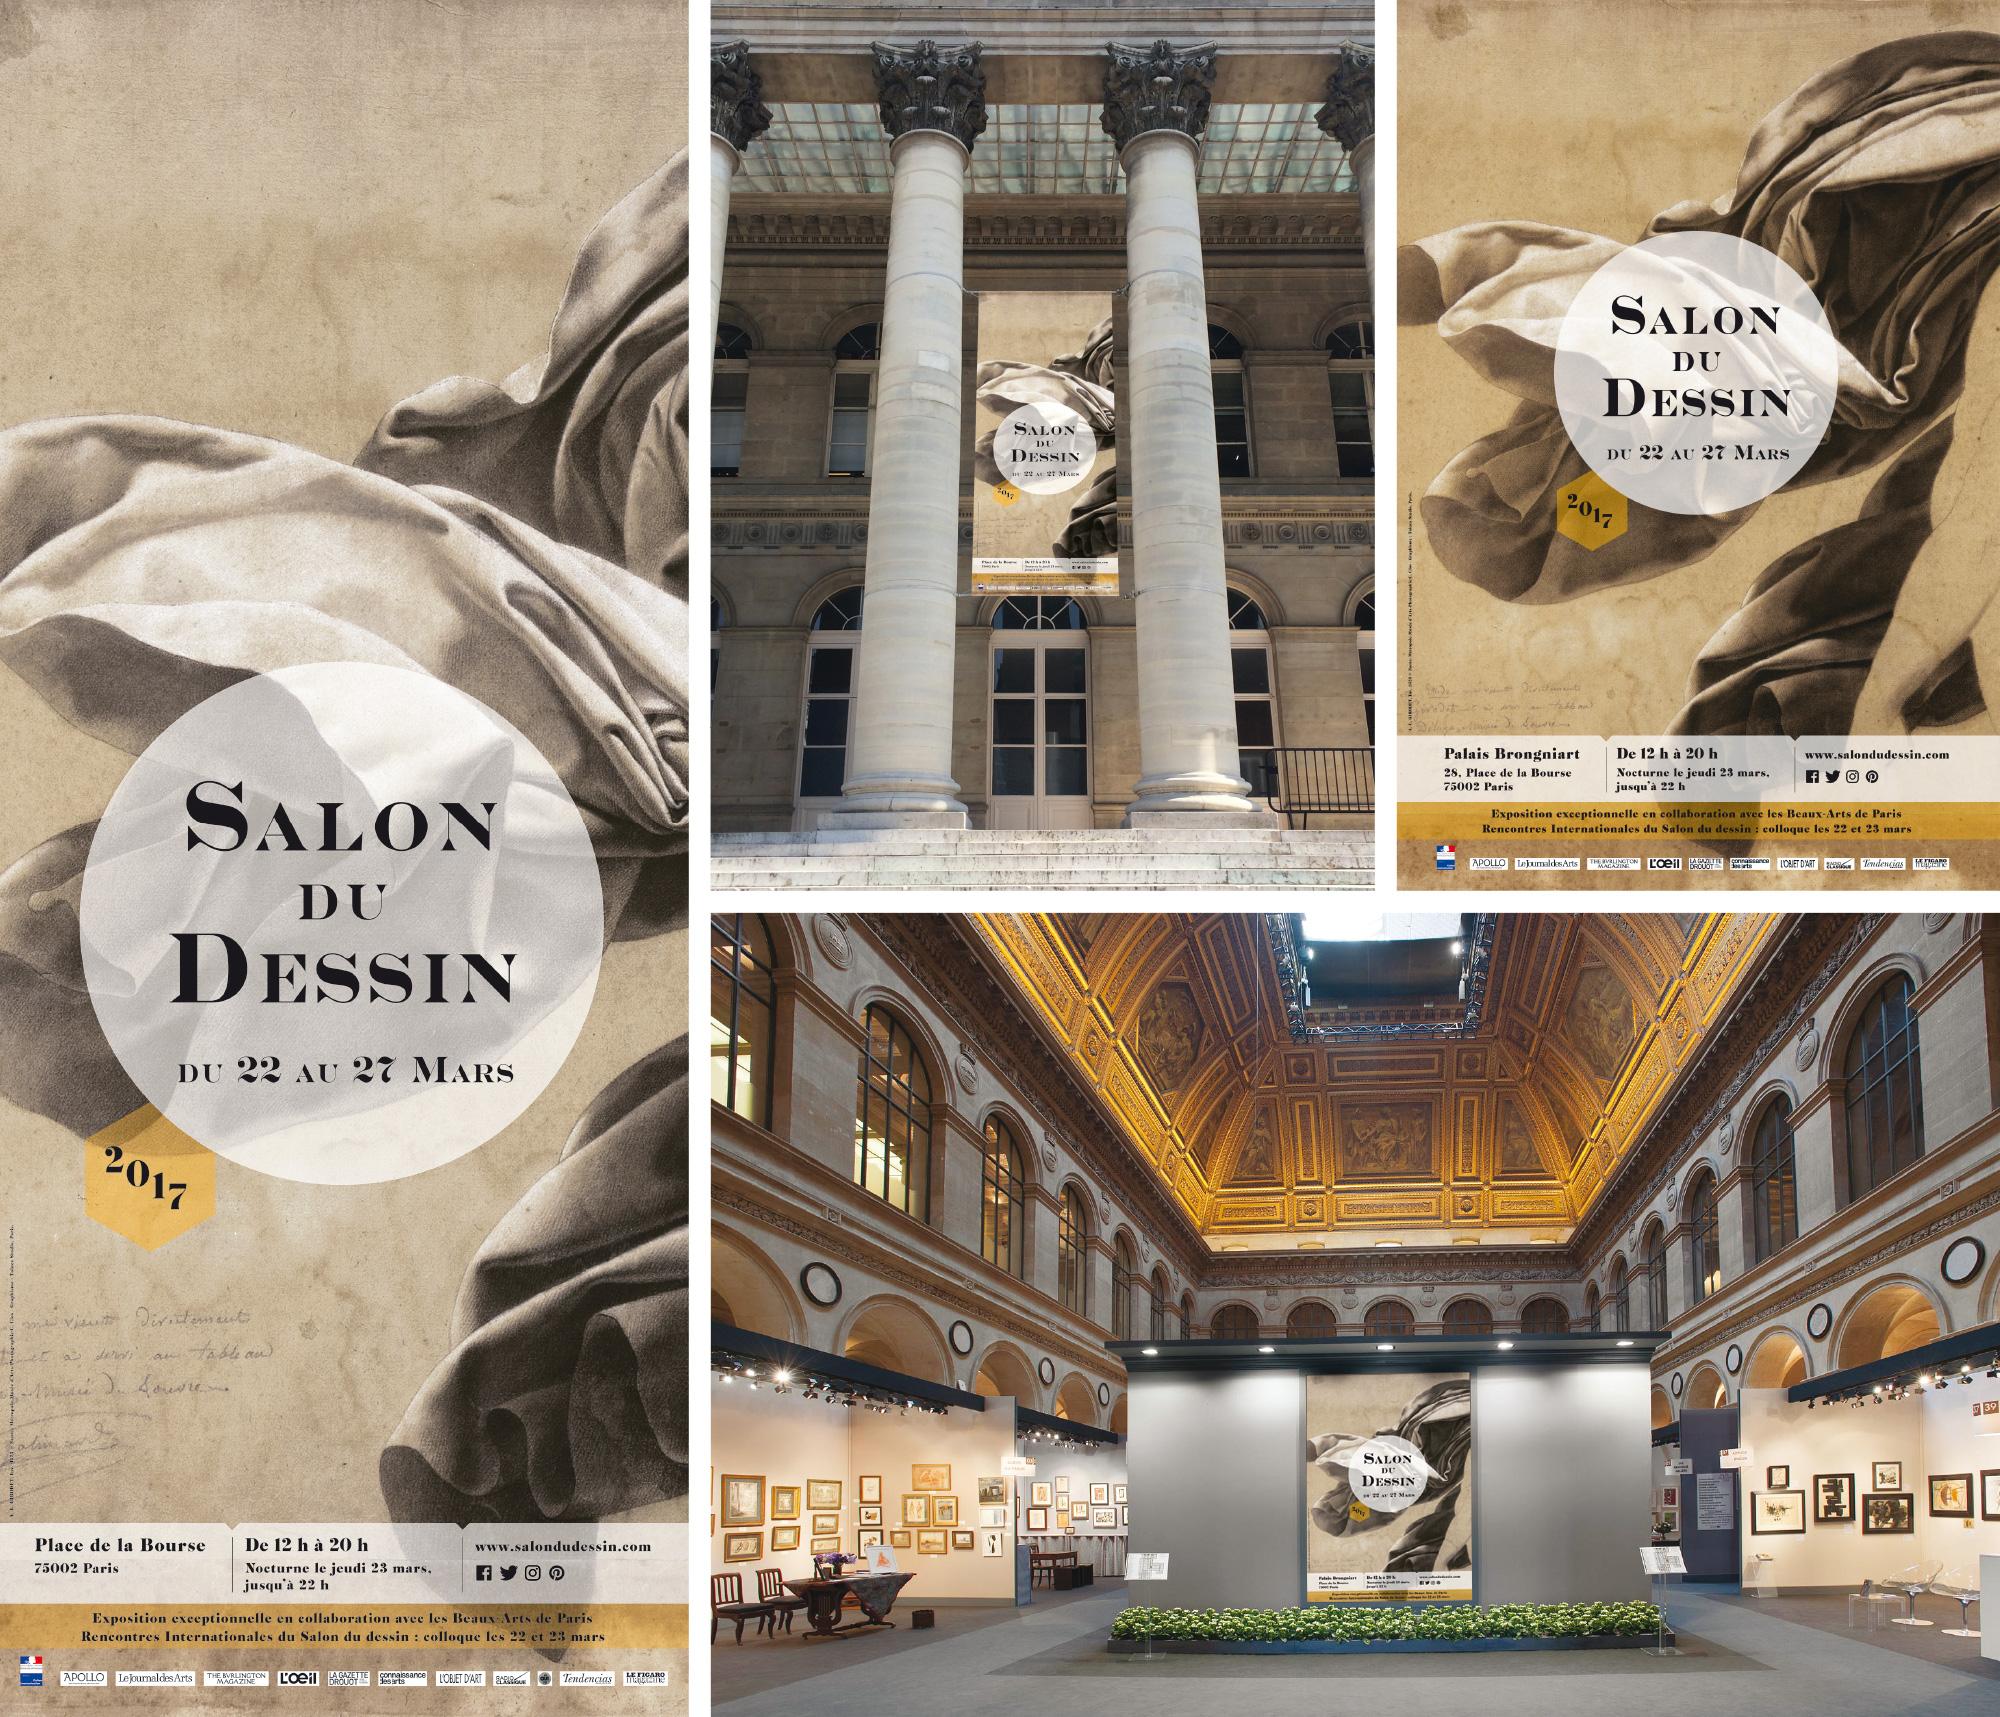 TOLUCA-STUDIO-OLIVIER-ANDREOTTI-SALON-DU-DESSIN-2017.jpg